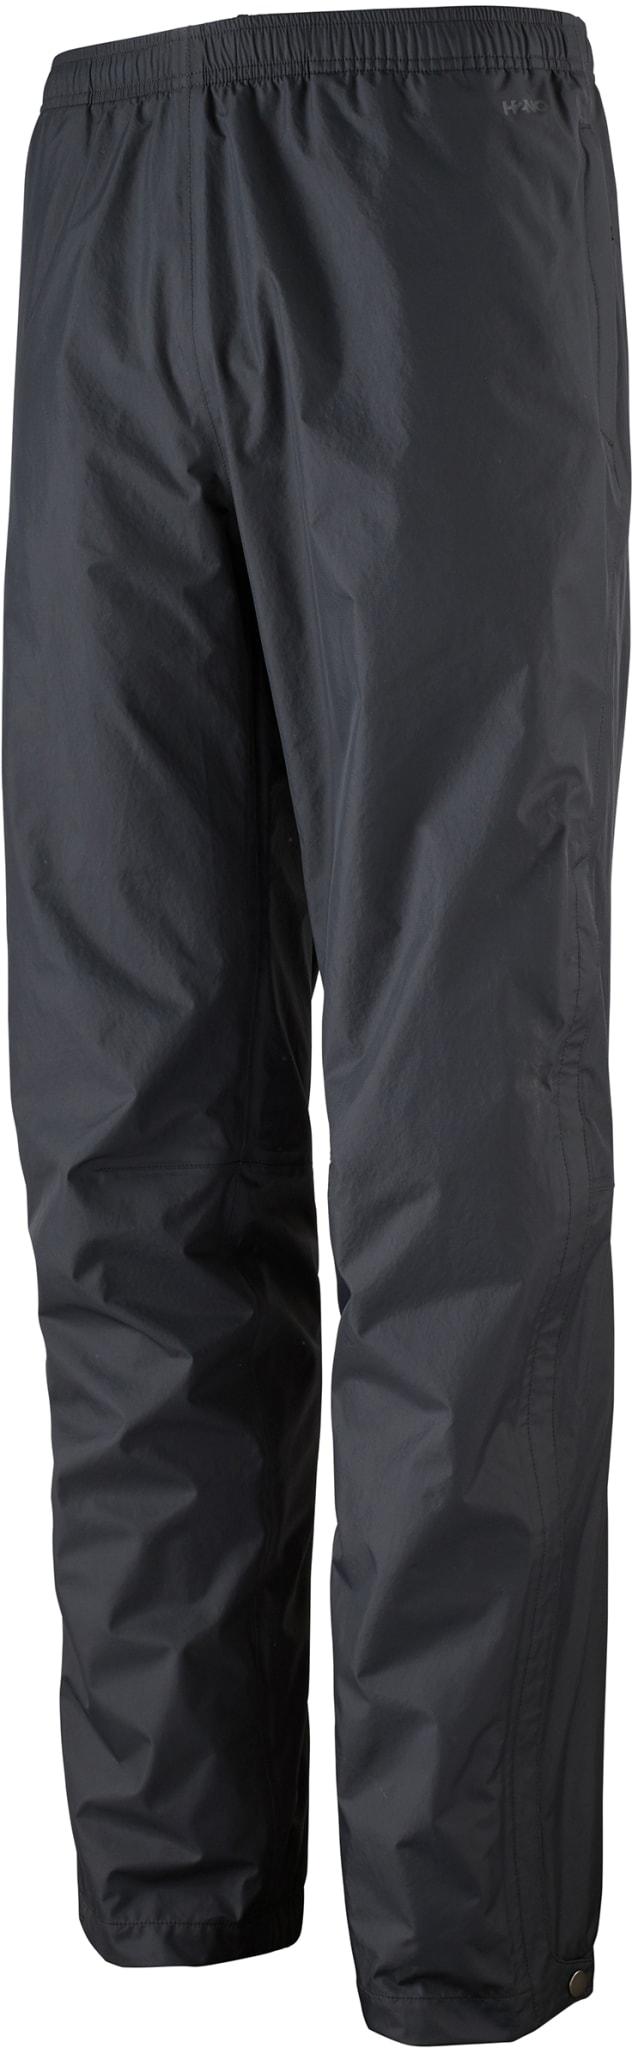 Torrentshell 3-Layer Pants Regular M